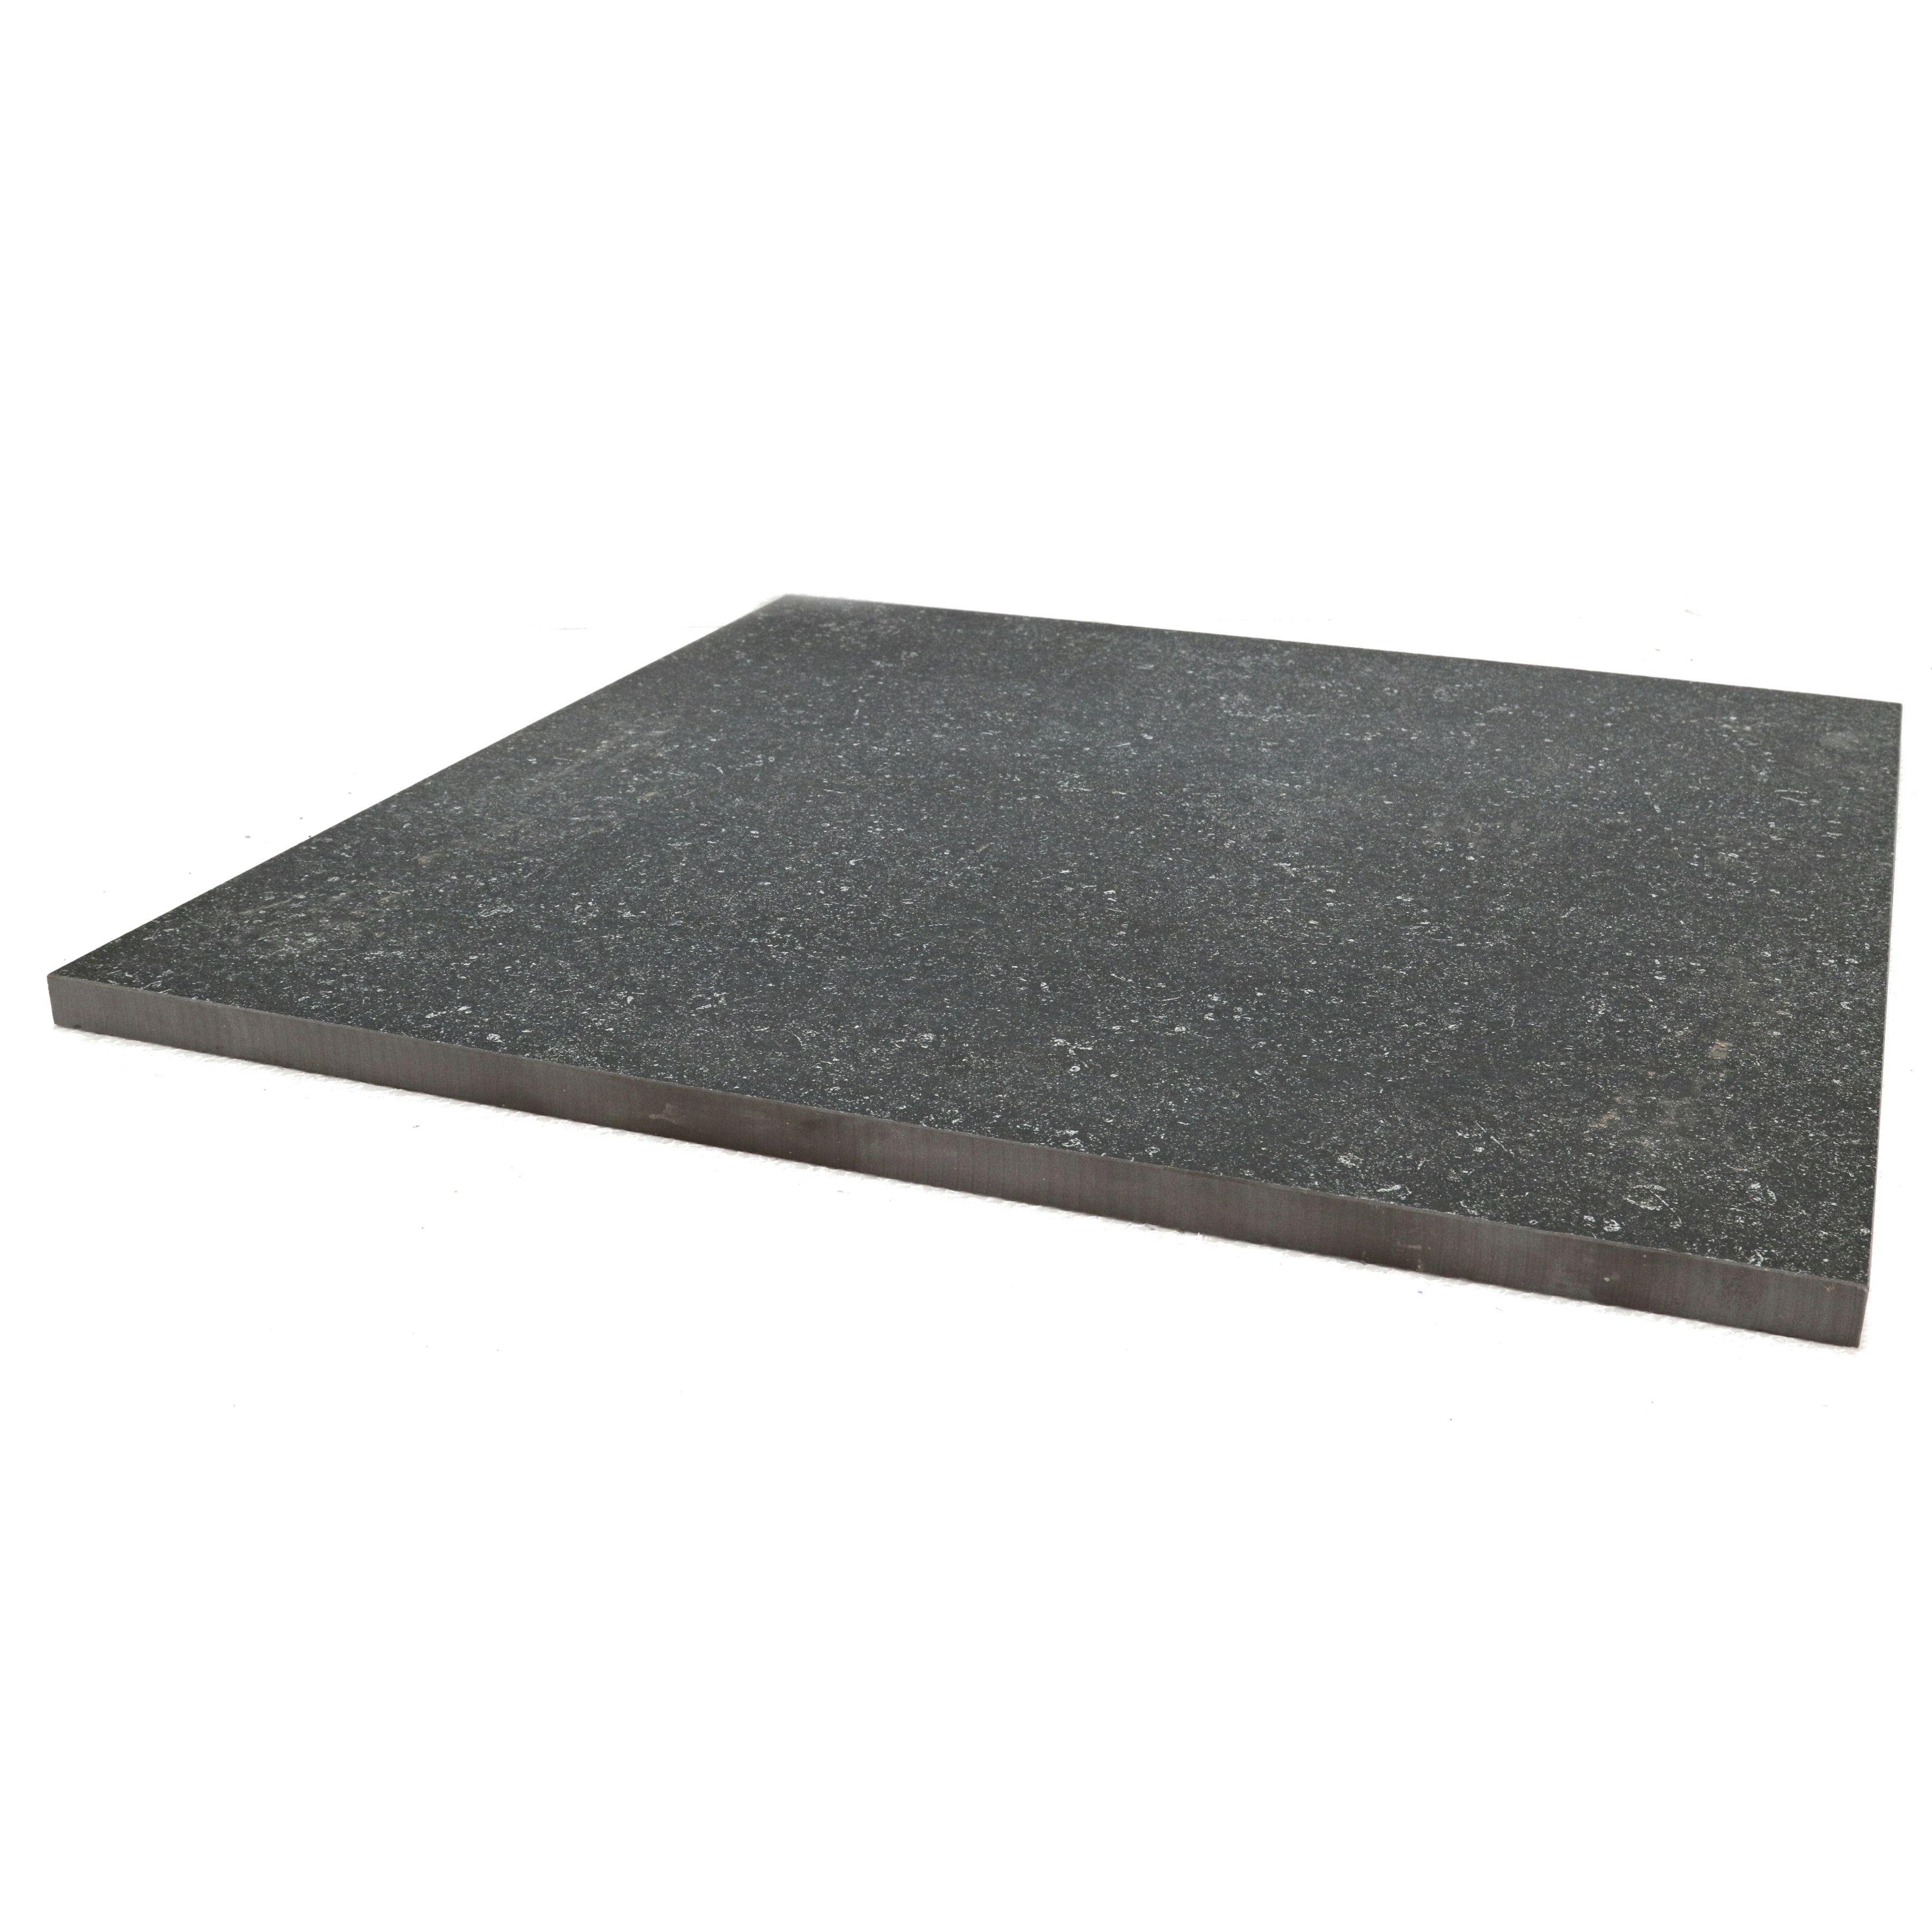 Tuintegels 60x60 Zwart.Terrastegel Keramisch Solid Stone Spots Zwart 60x60 Cm 68